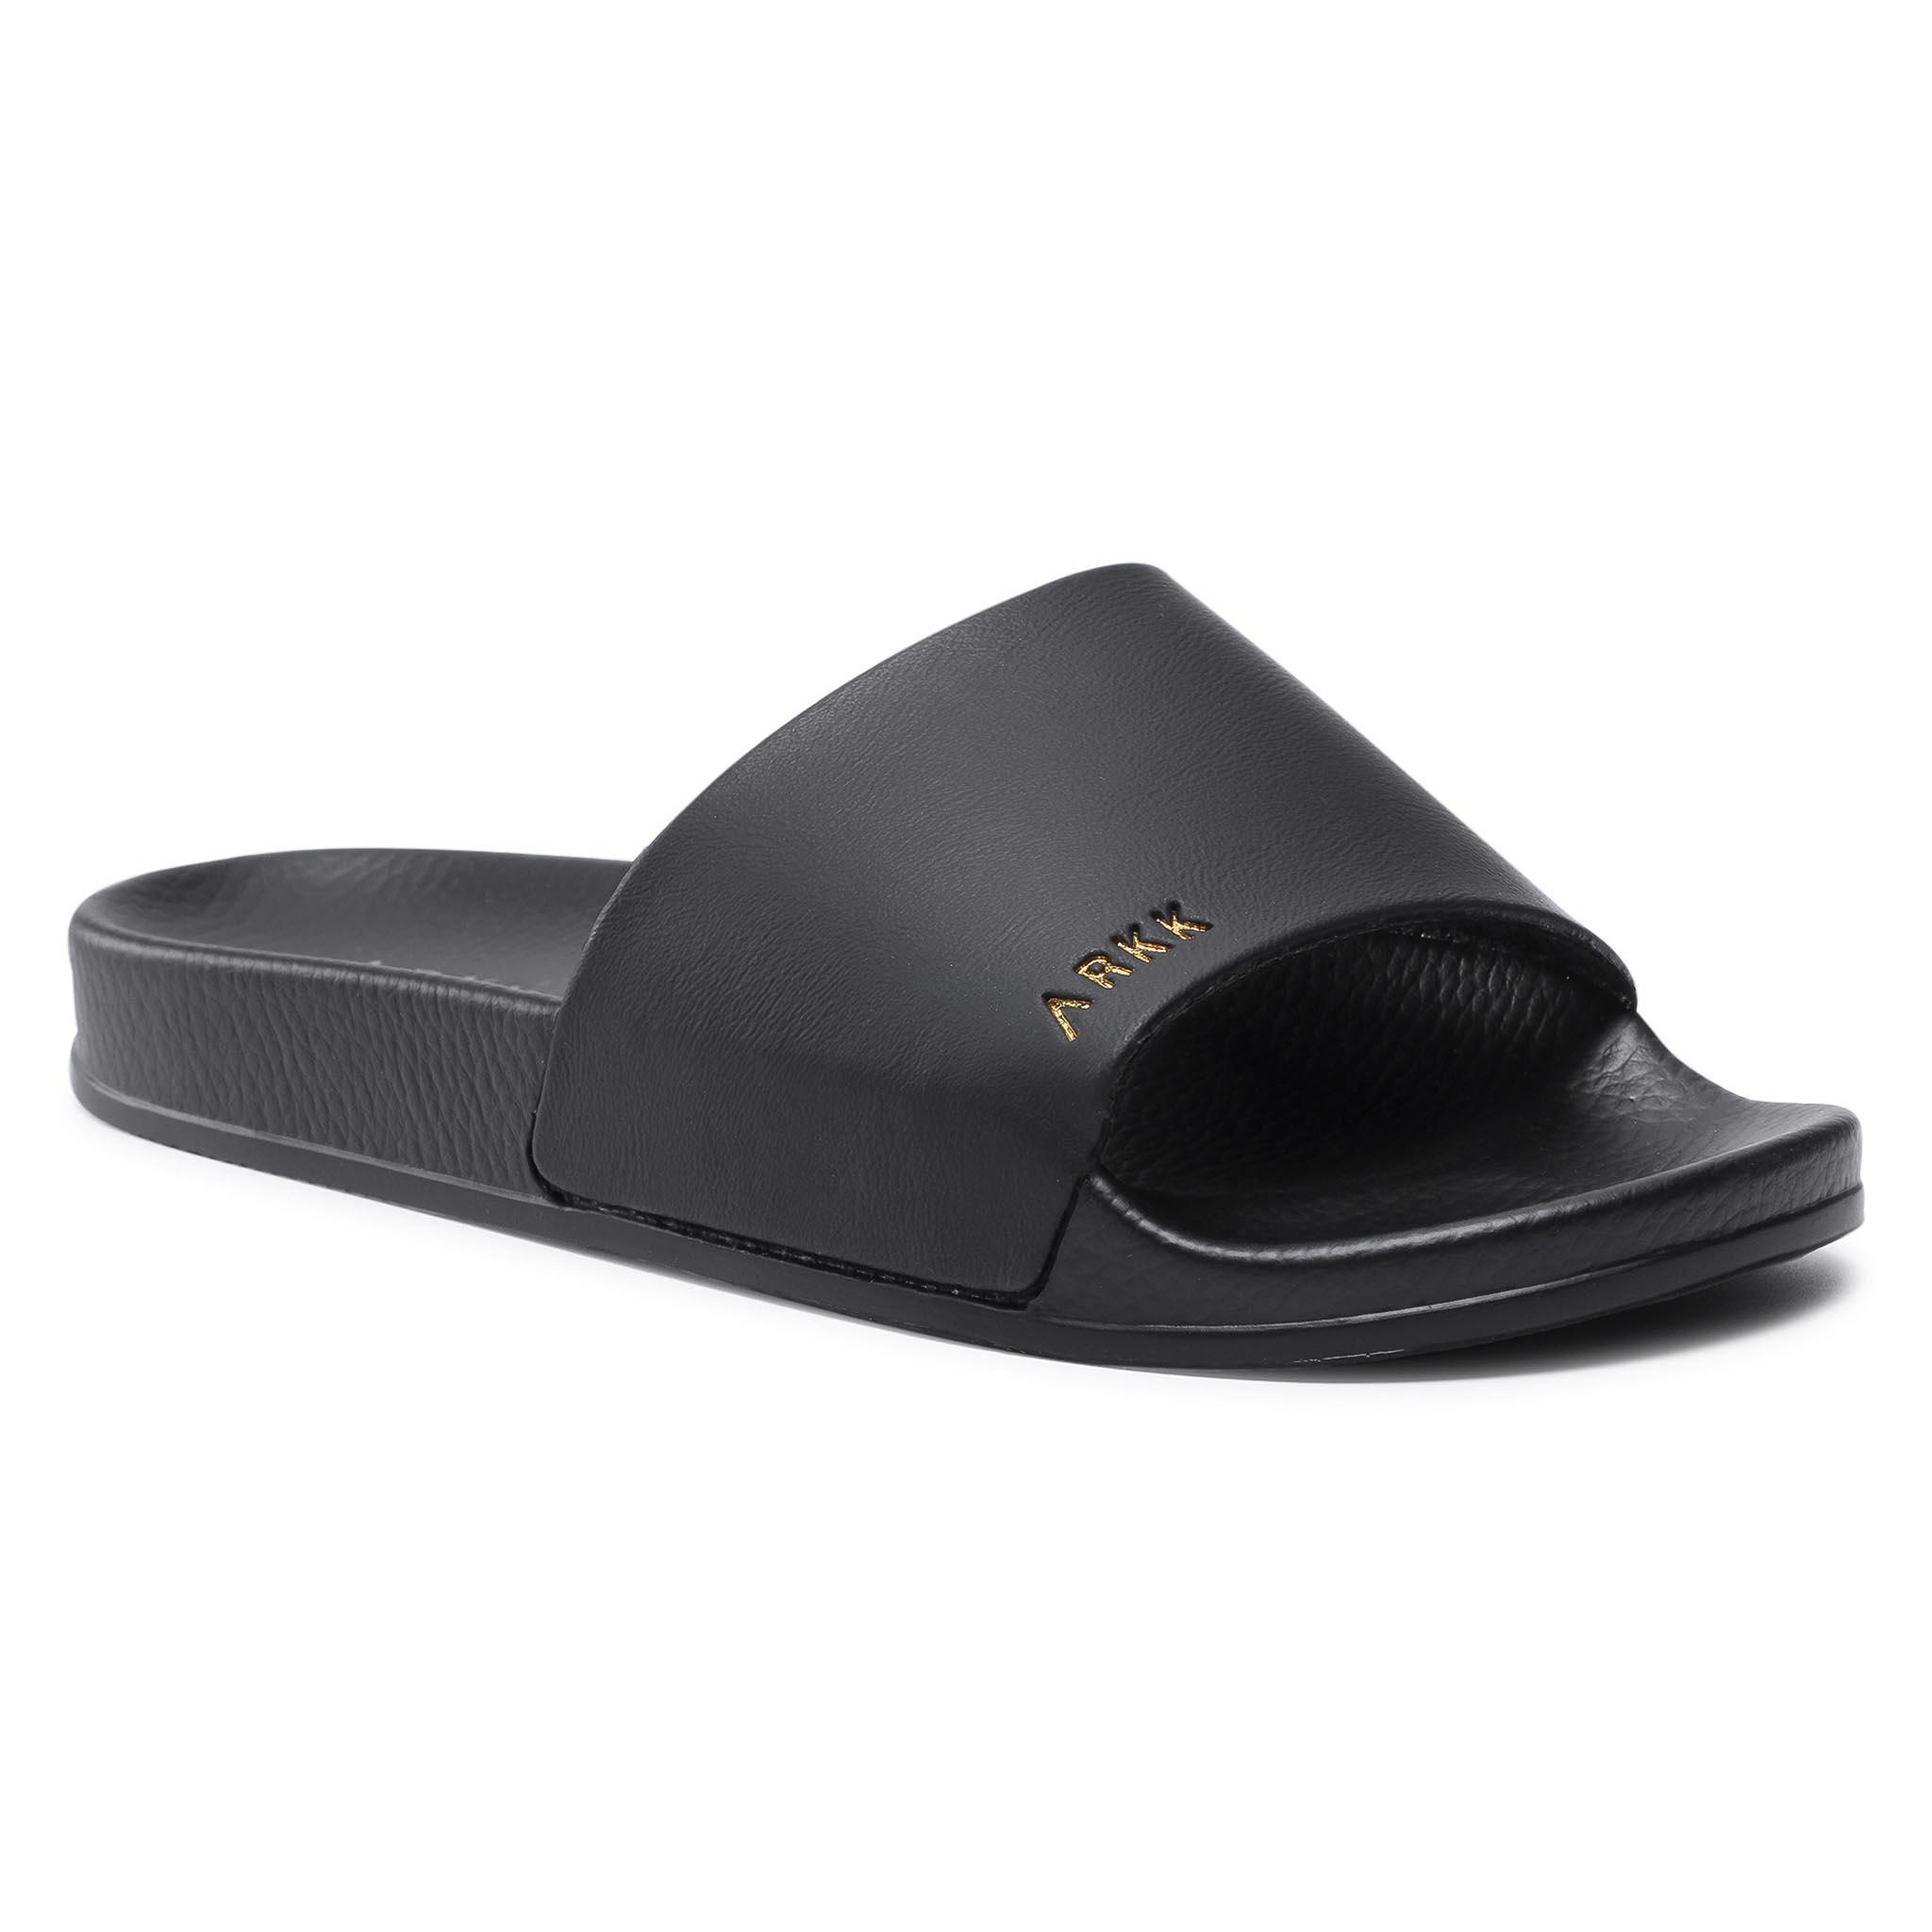 Image of Pantoletten ARKK COPENHAGEN - Slides Premium CO6403-0099-W Black